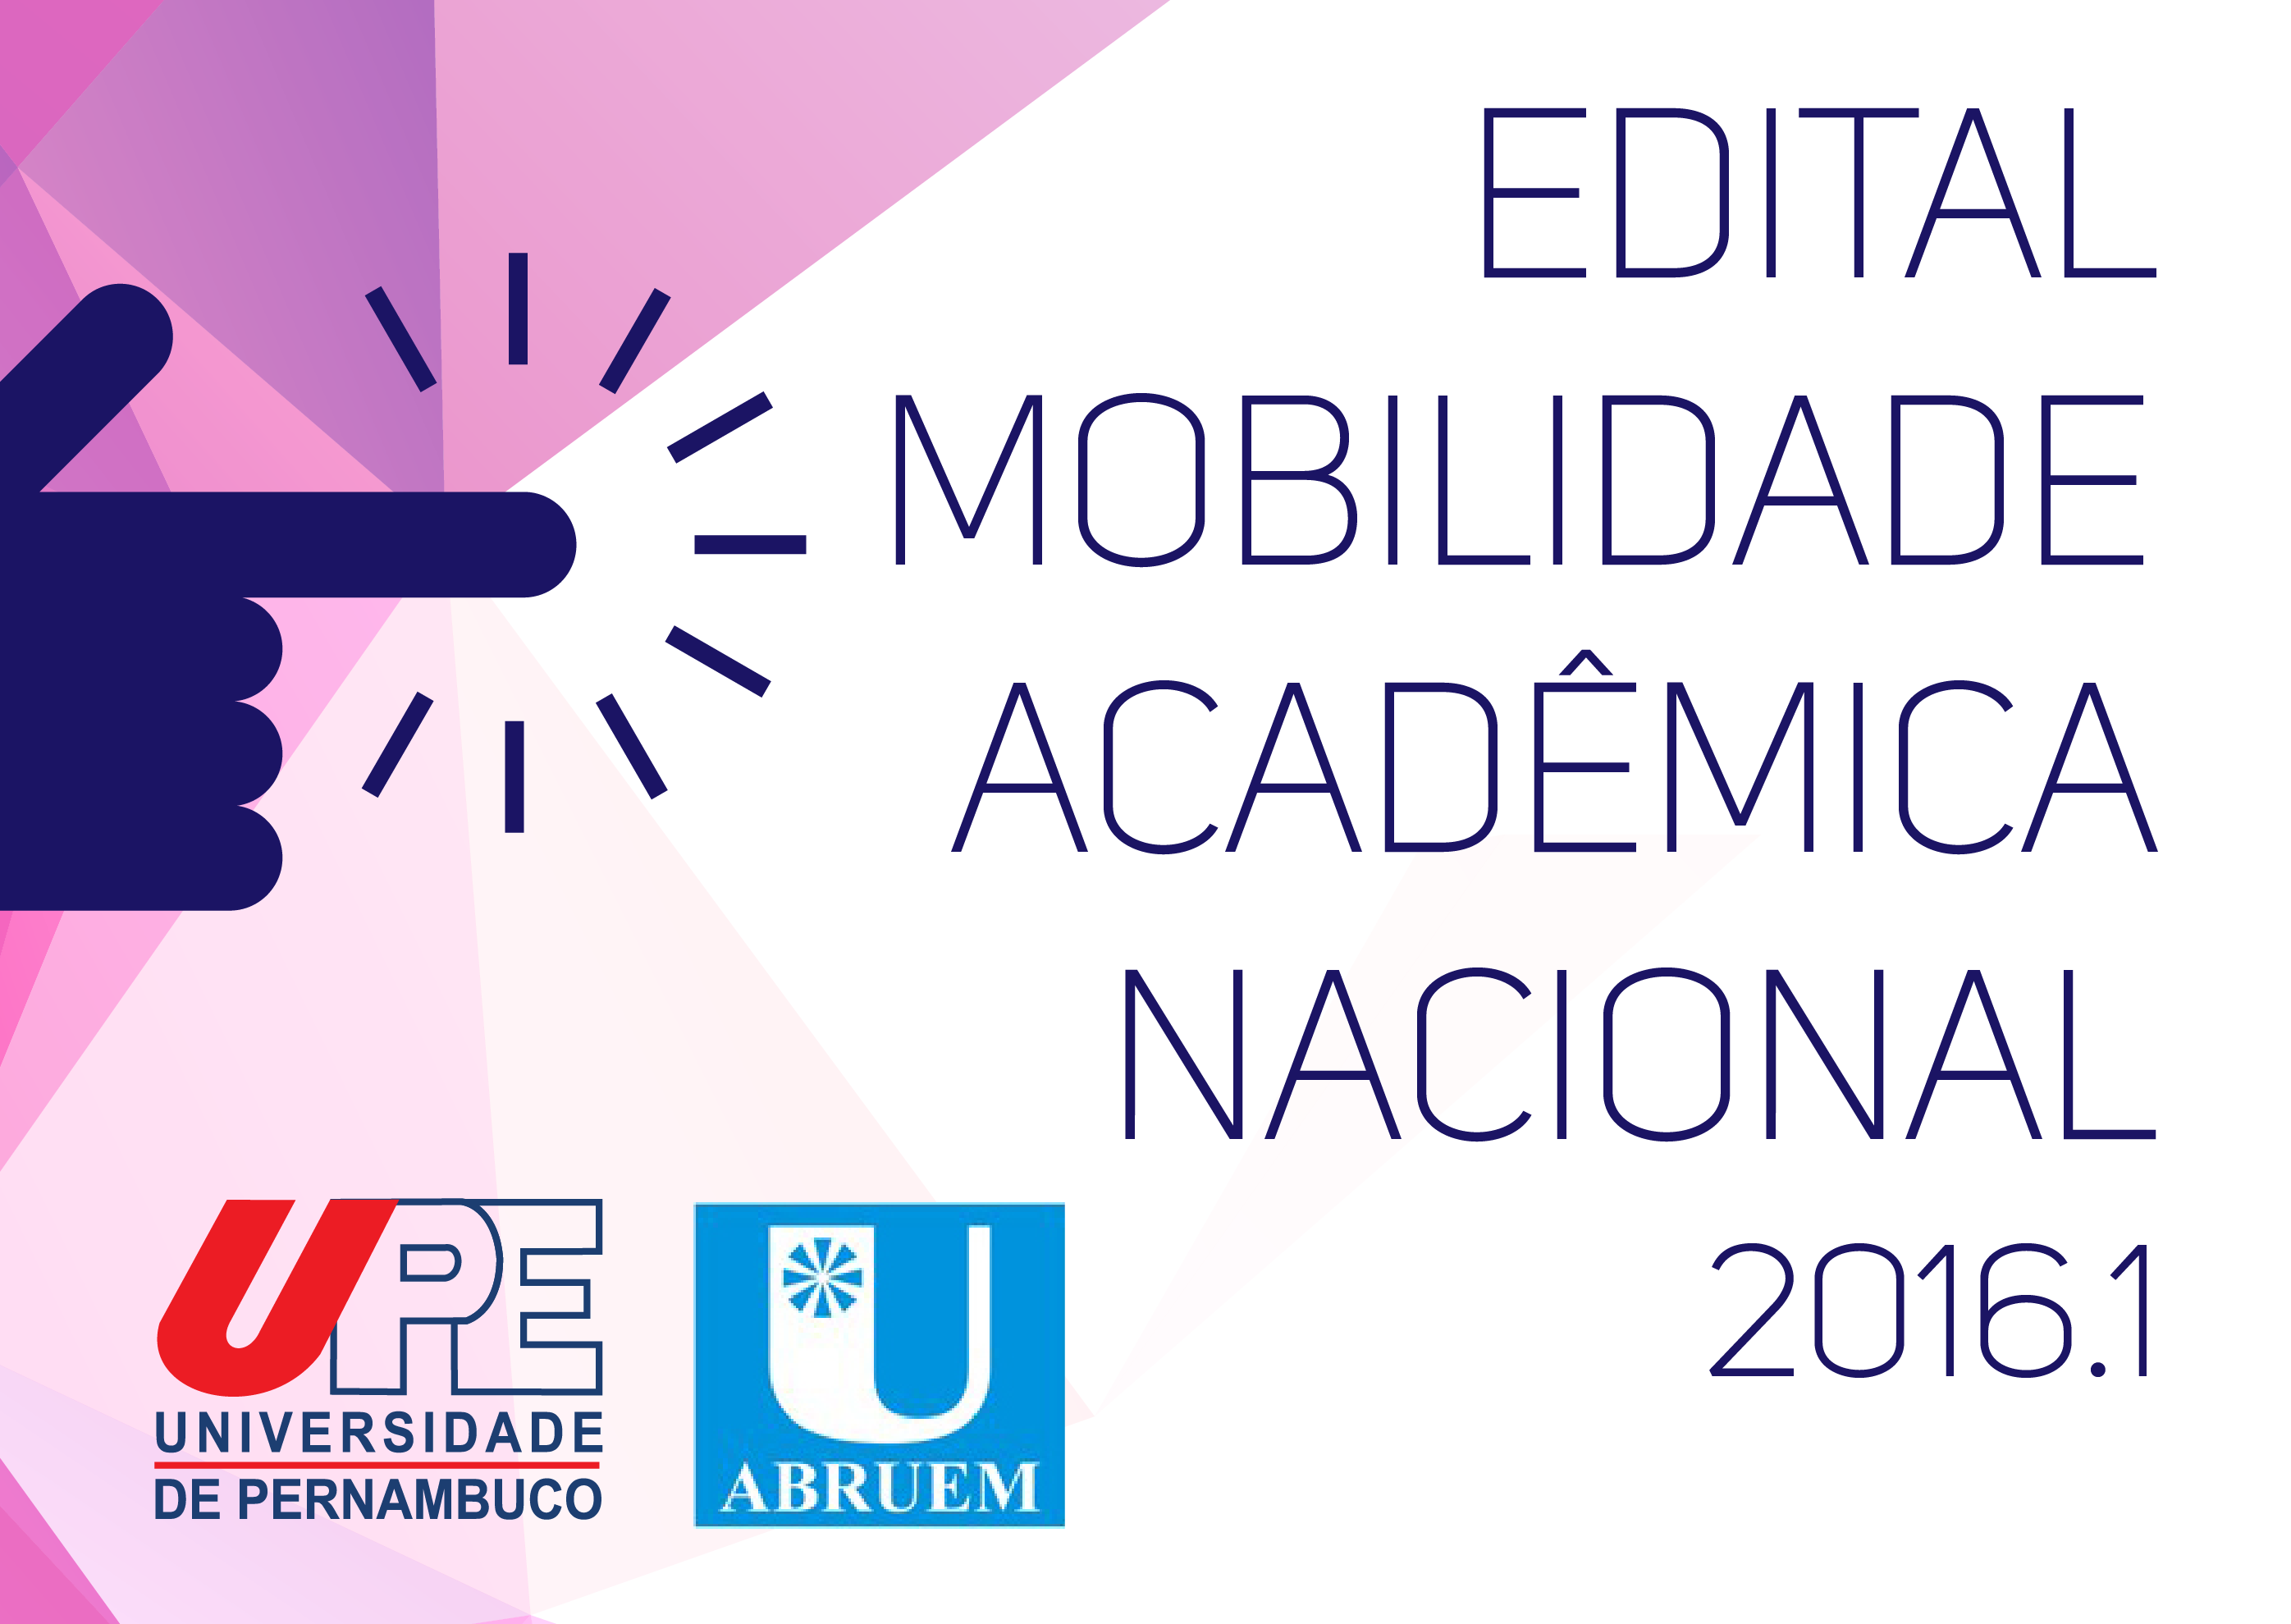 Edital-Mobilidade-Academica-01-01